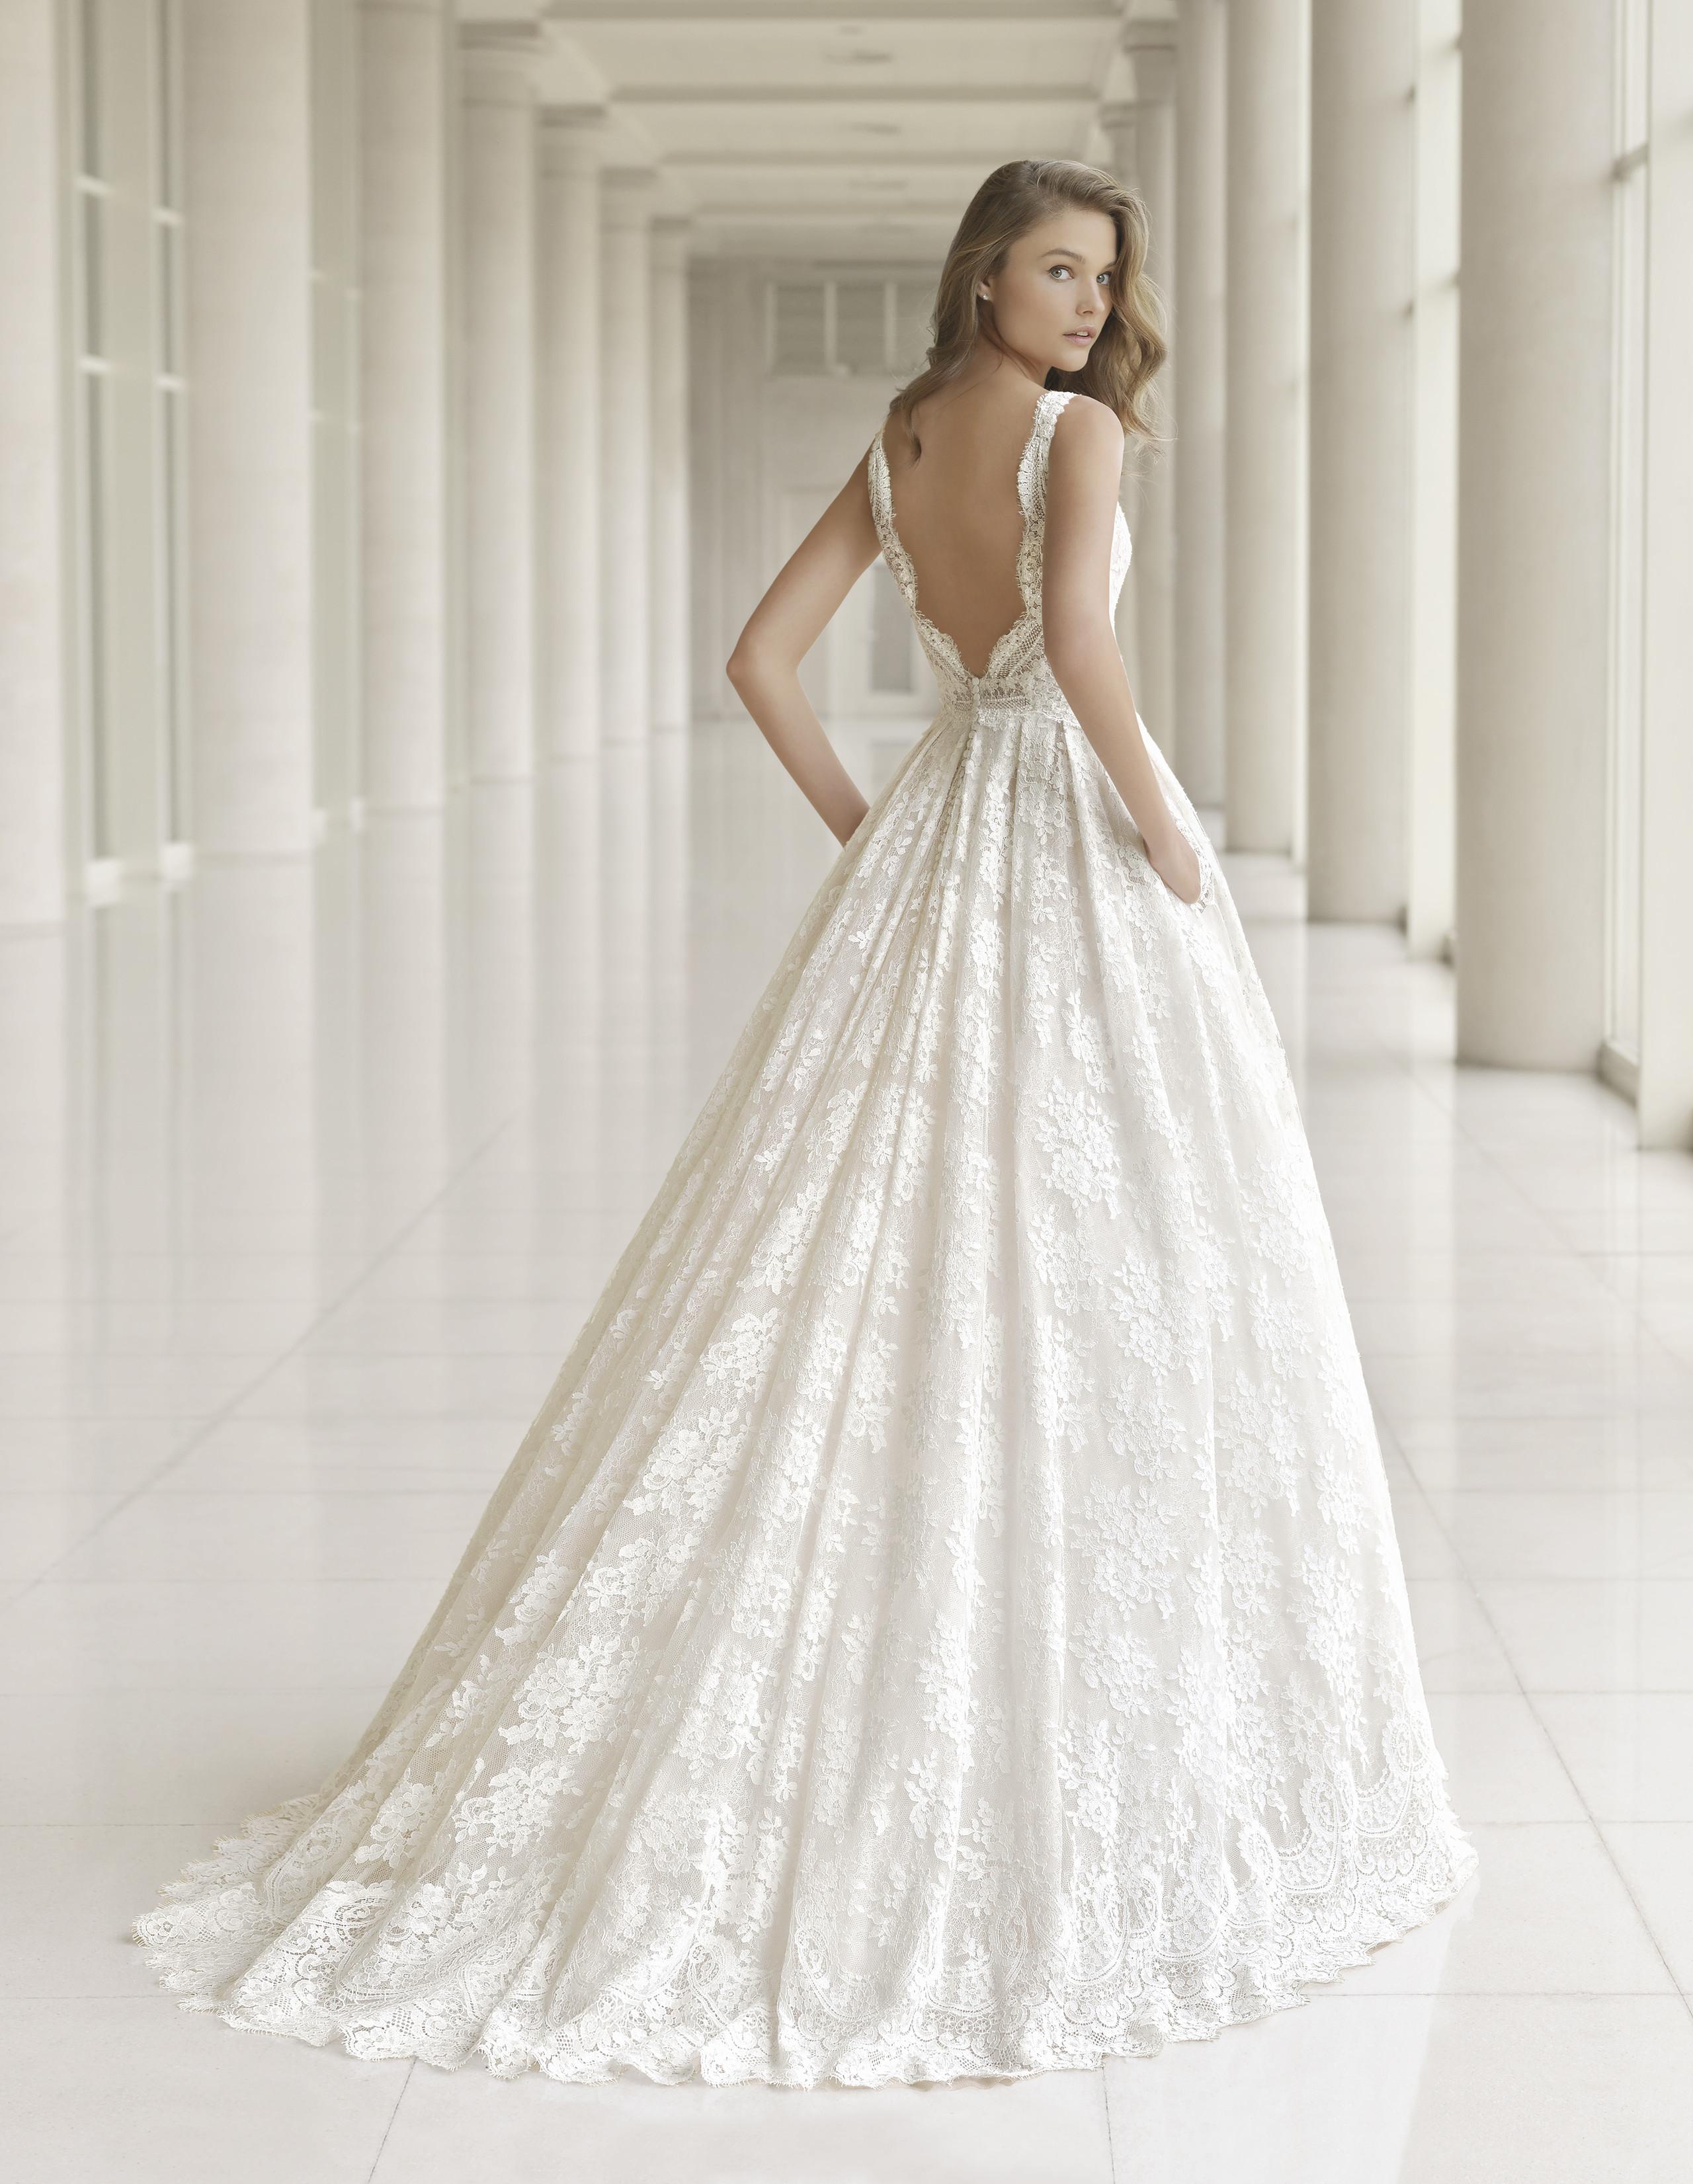 wedding dresses under 500 photo - 1